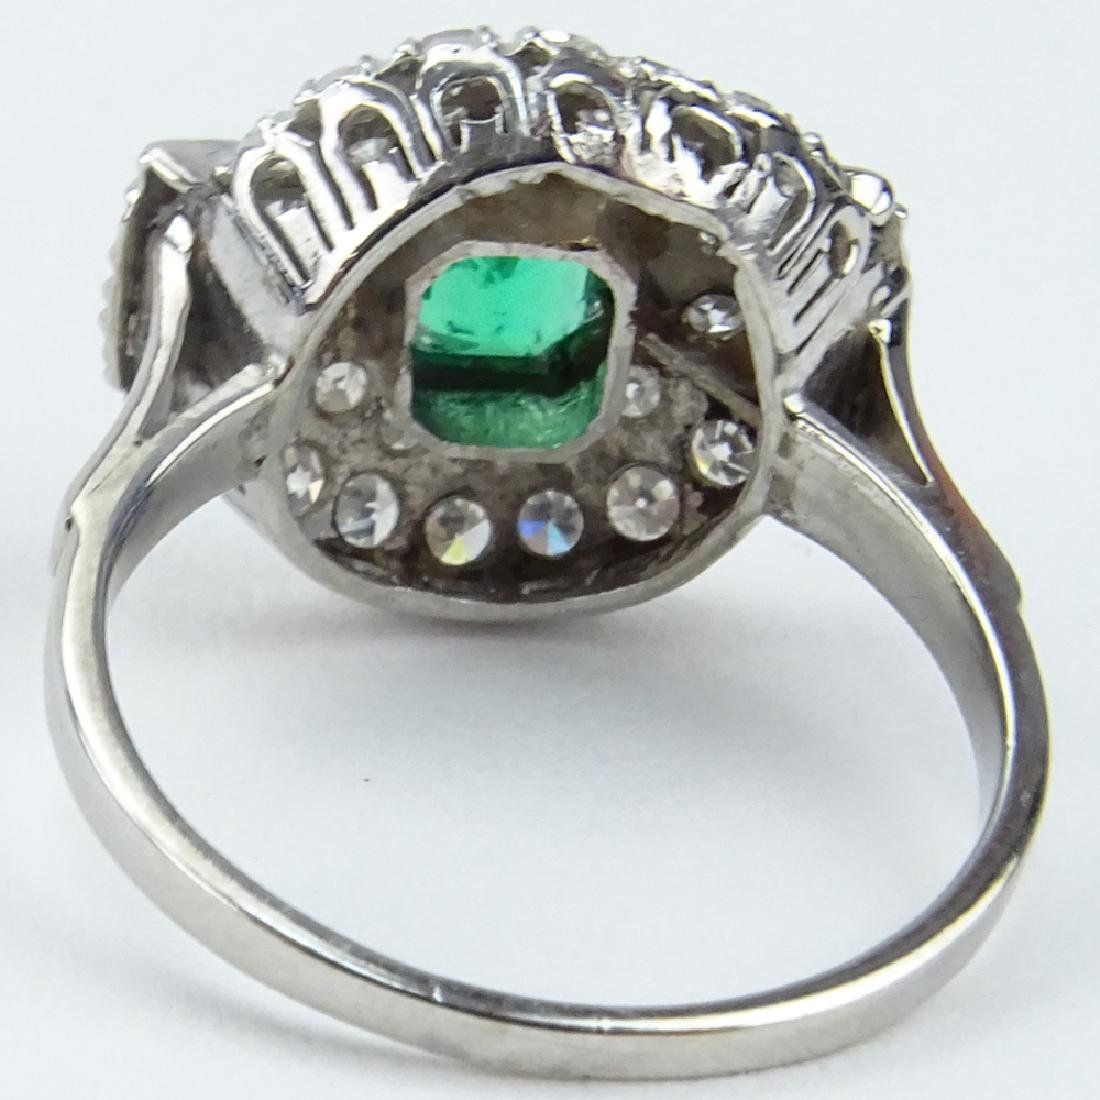 Vintage Approx. 1.75 Carat Emerald and Diamond Platinum - 2